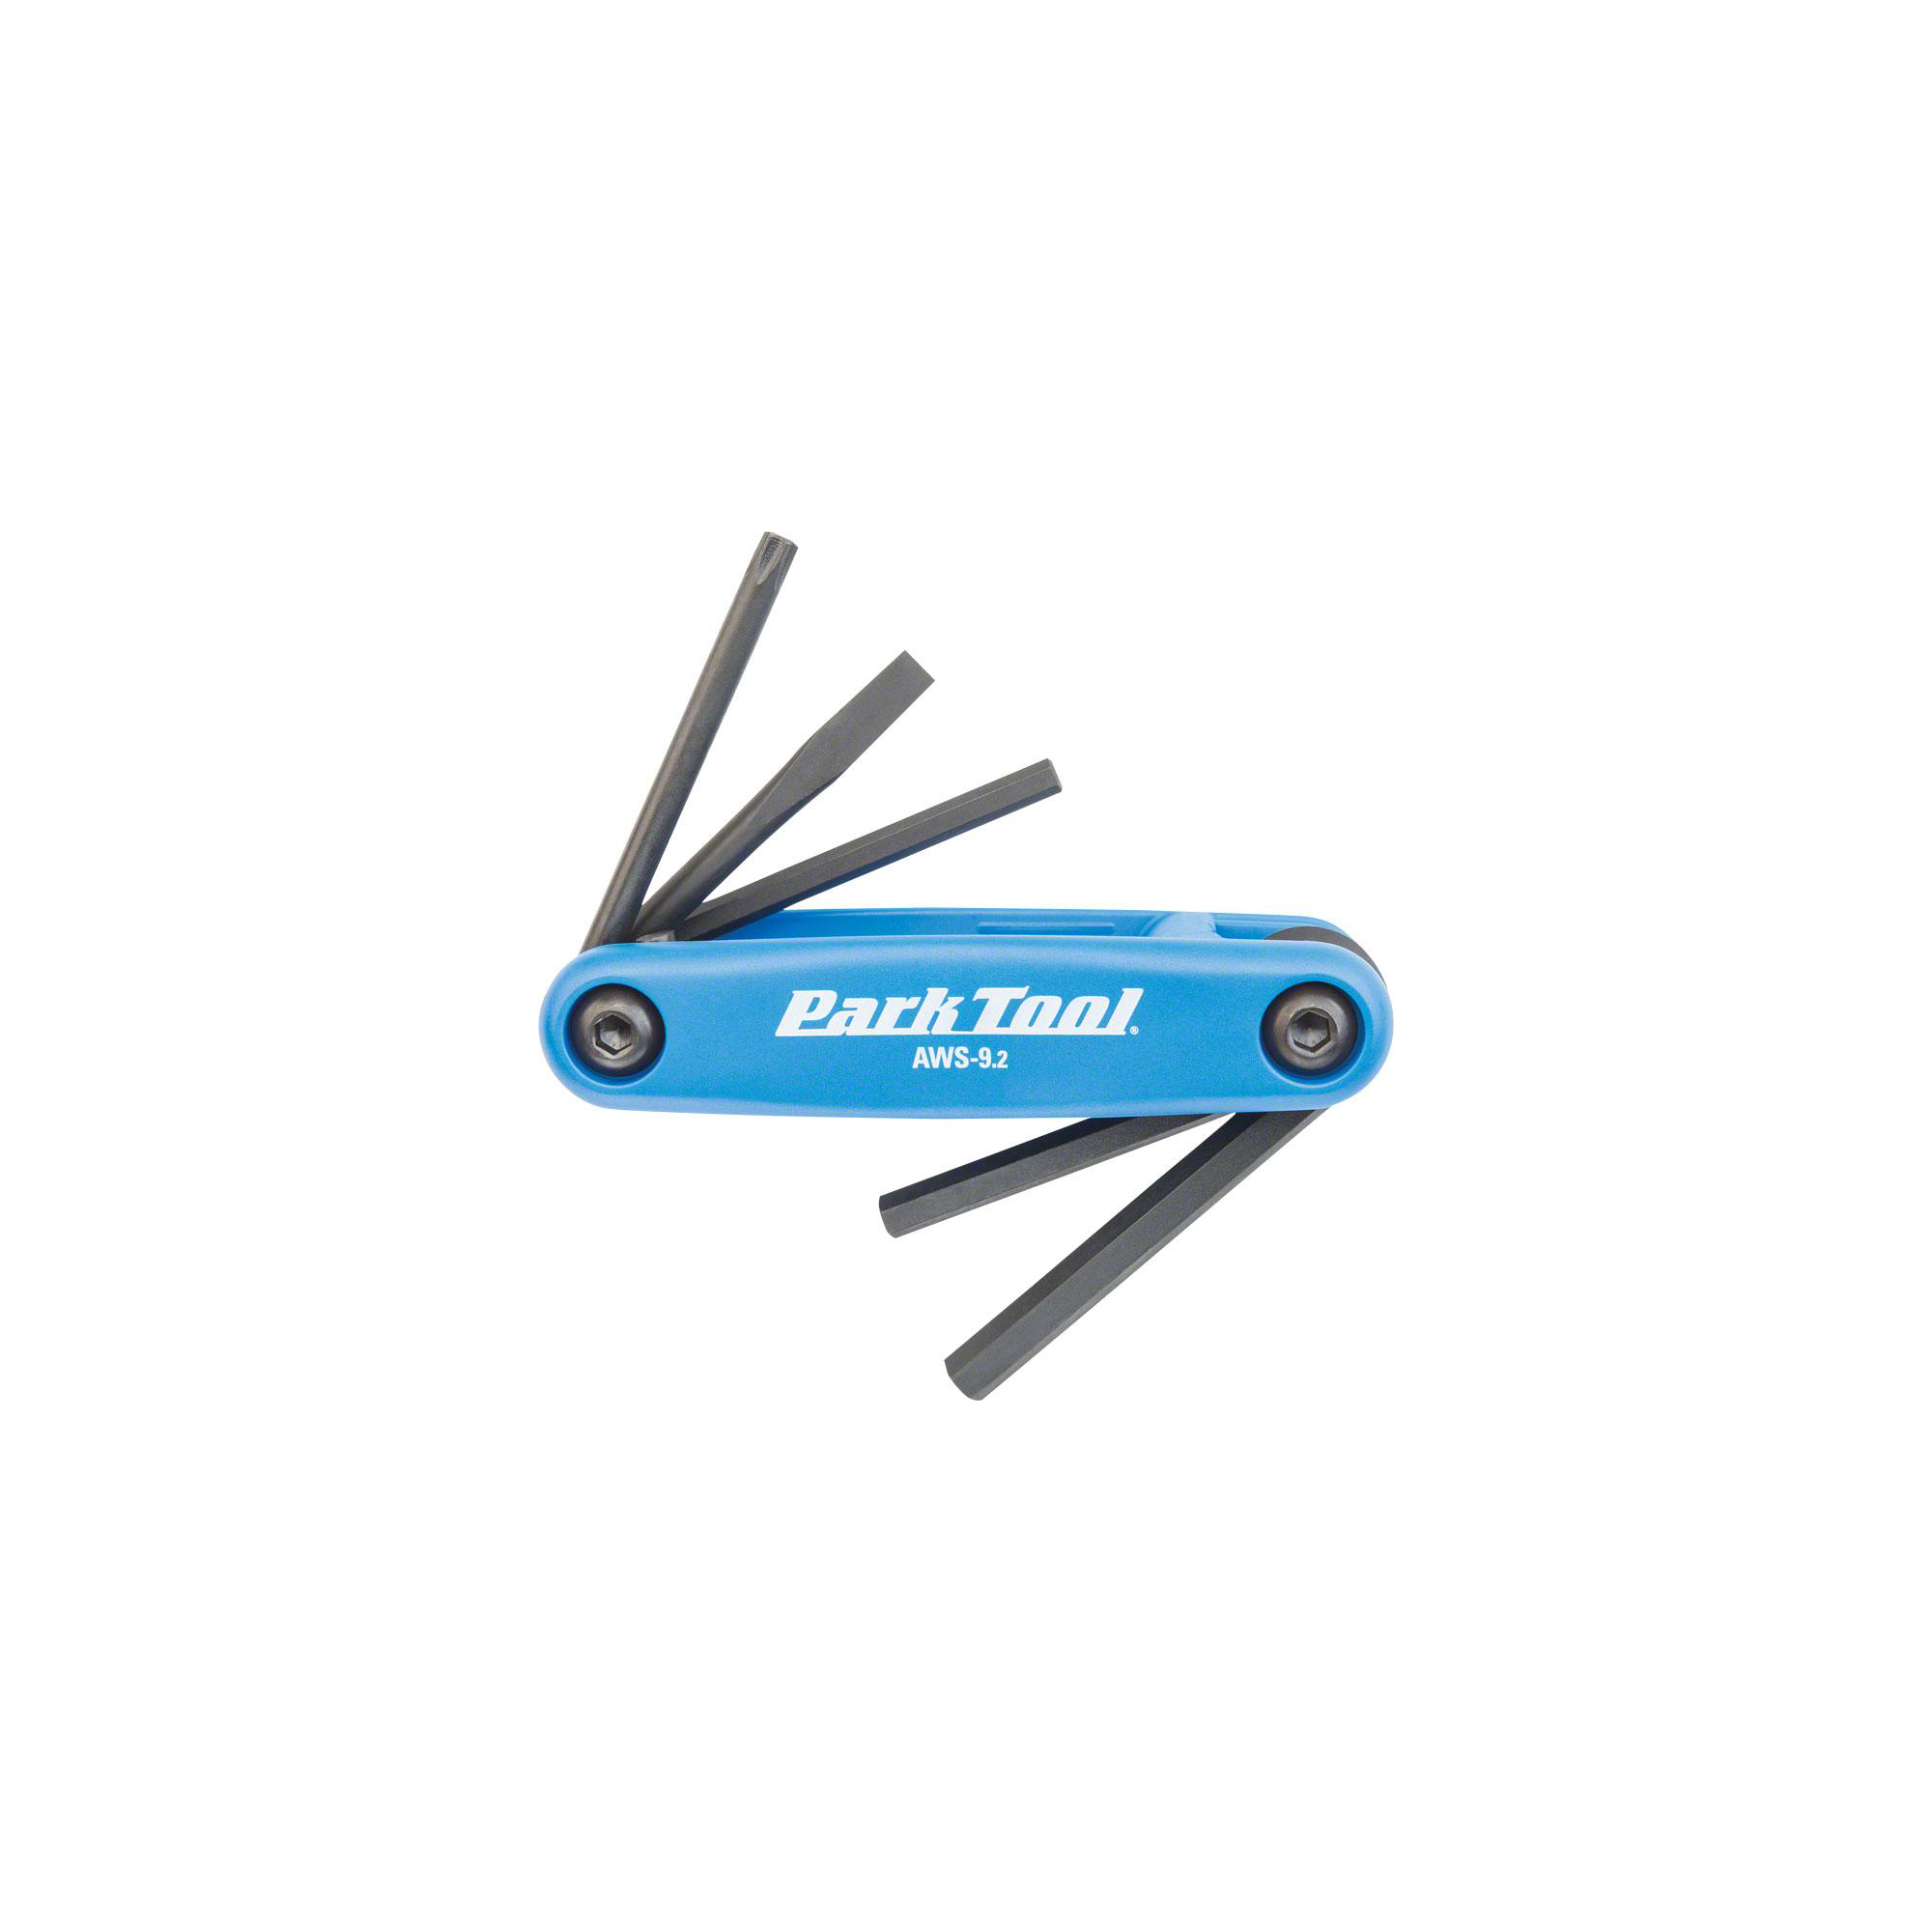 Park Tool AWS-9.2 Metric Folding Hex Wrench Set MTB Road Bike Multi-Tool